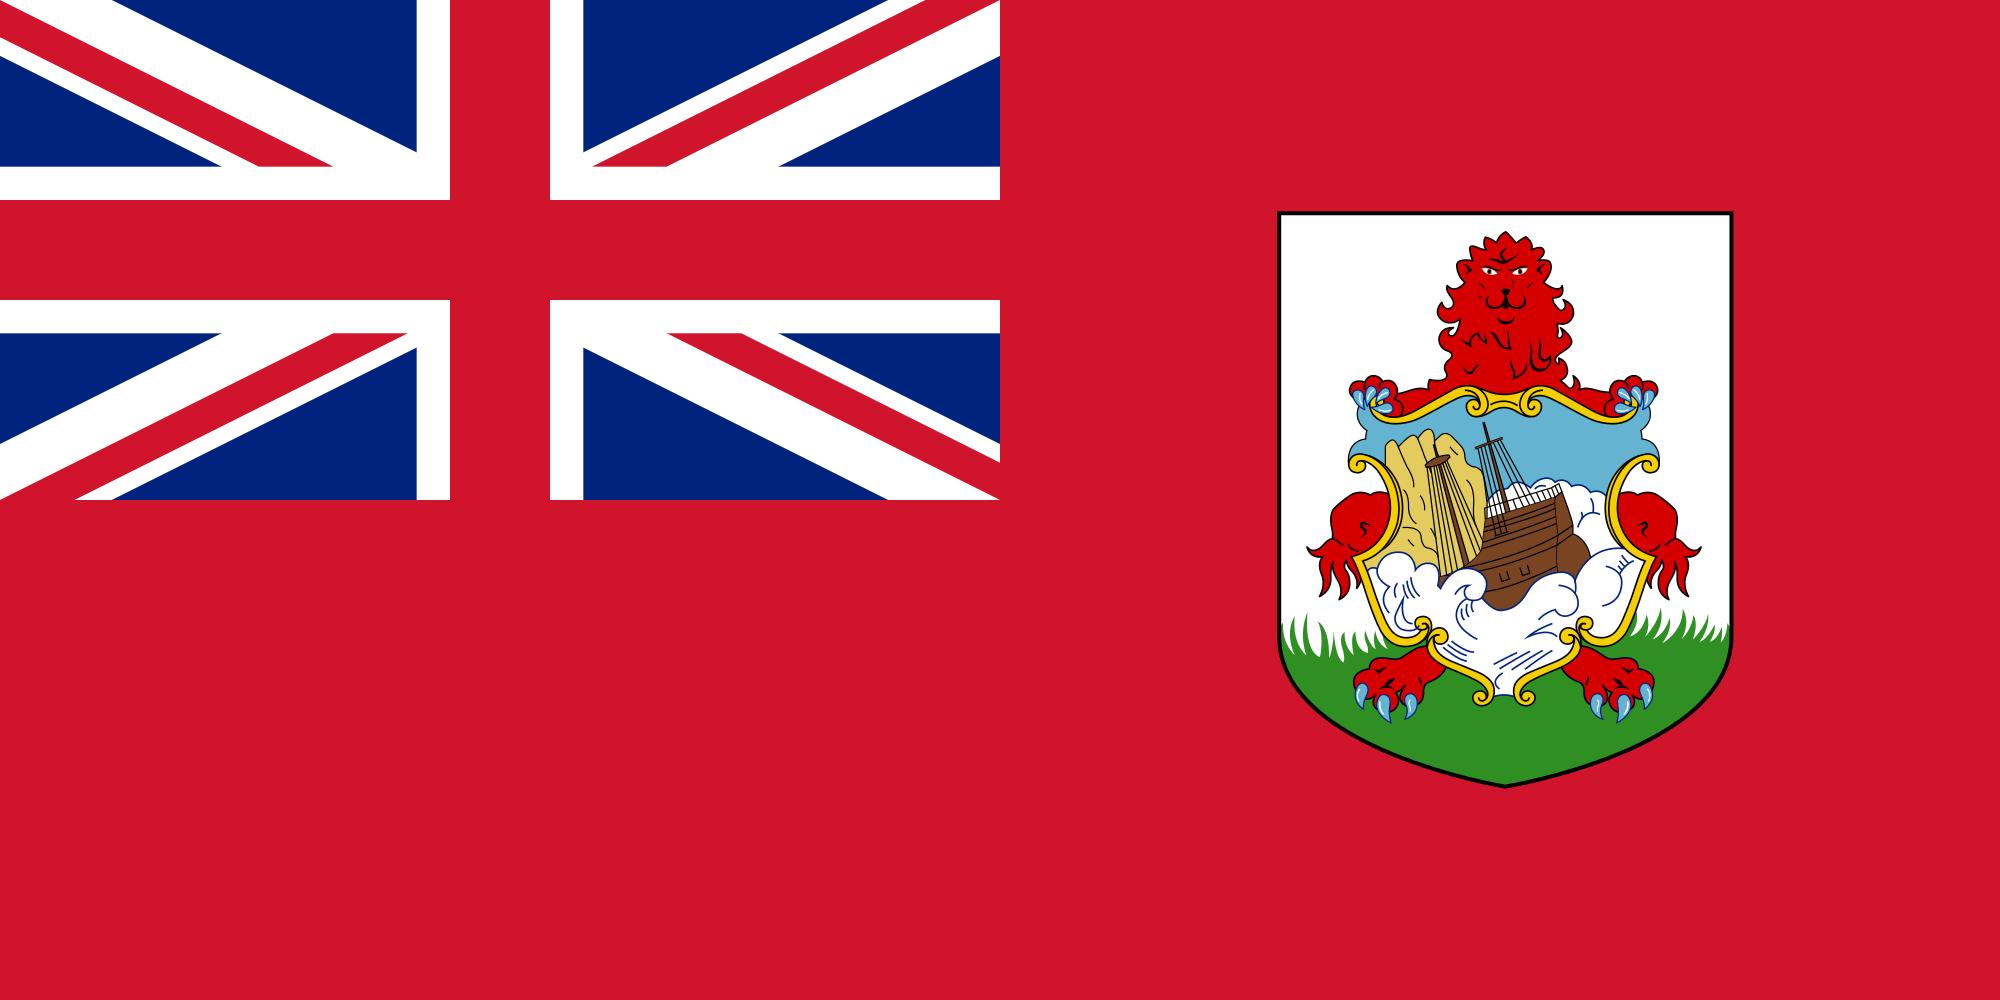 bermudas, देश, emblema, लोग�प्रतीकbolo - HD वॉलपेपर - प्रोफेसर-falken.com